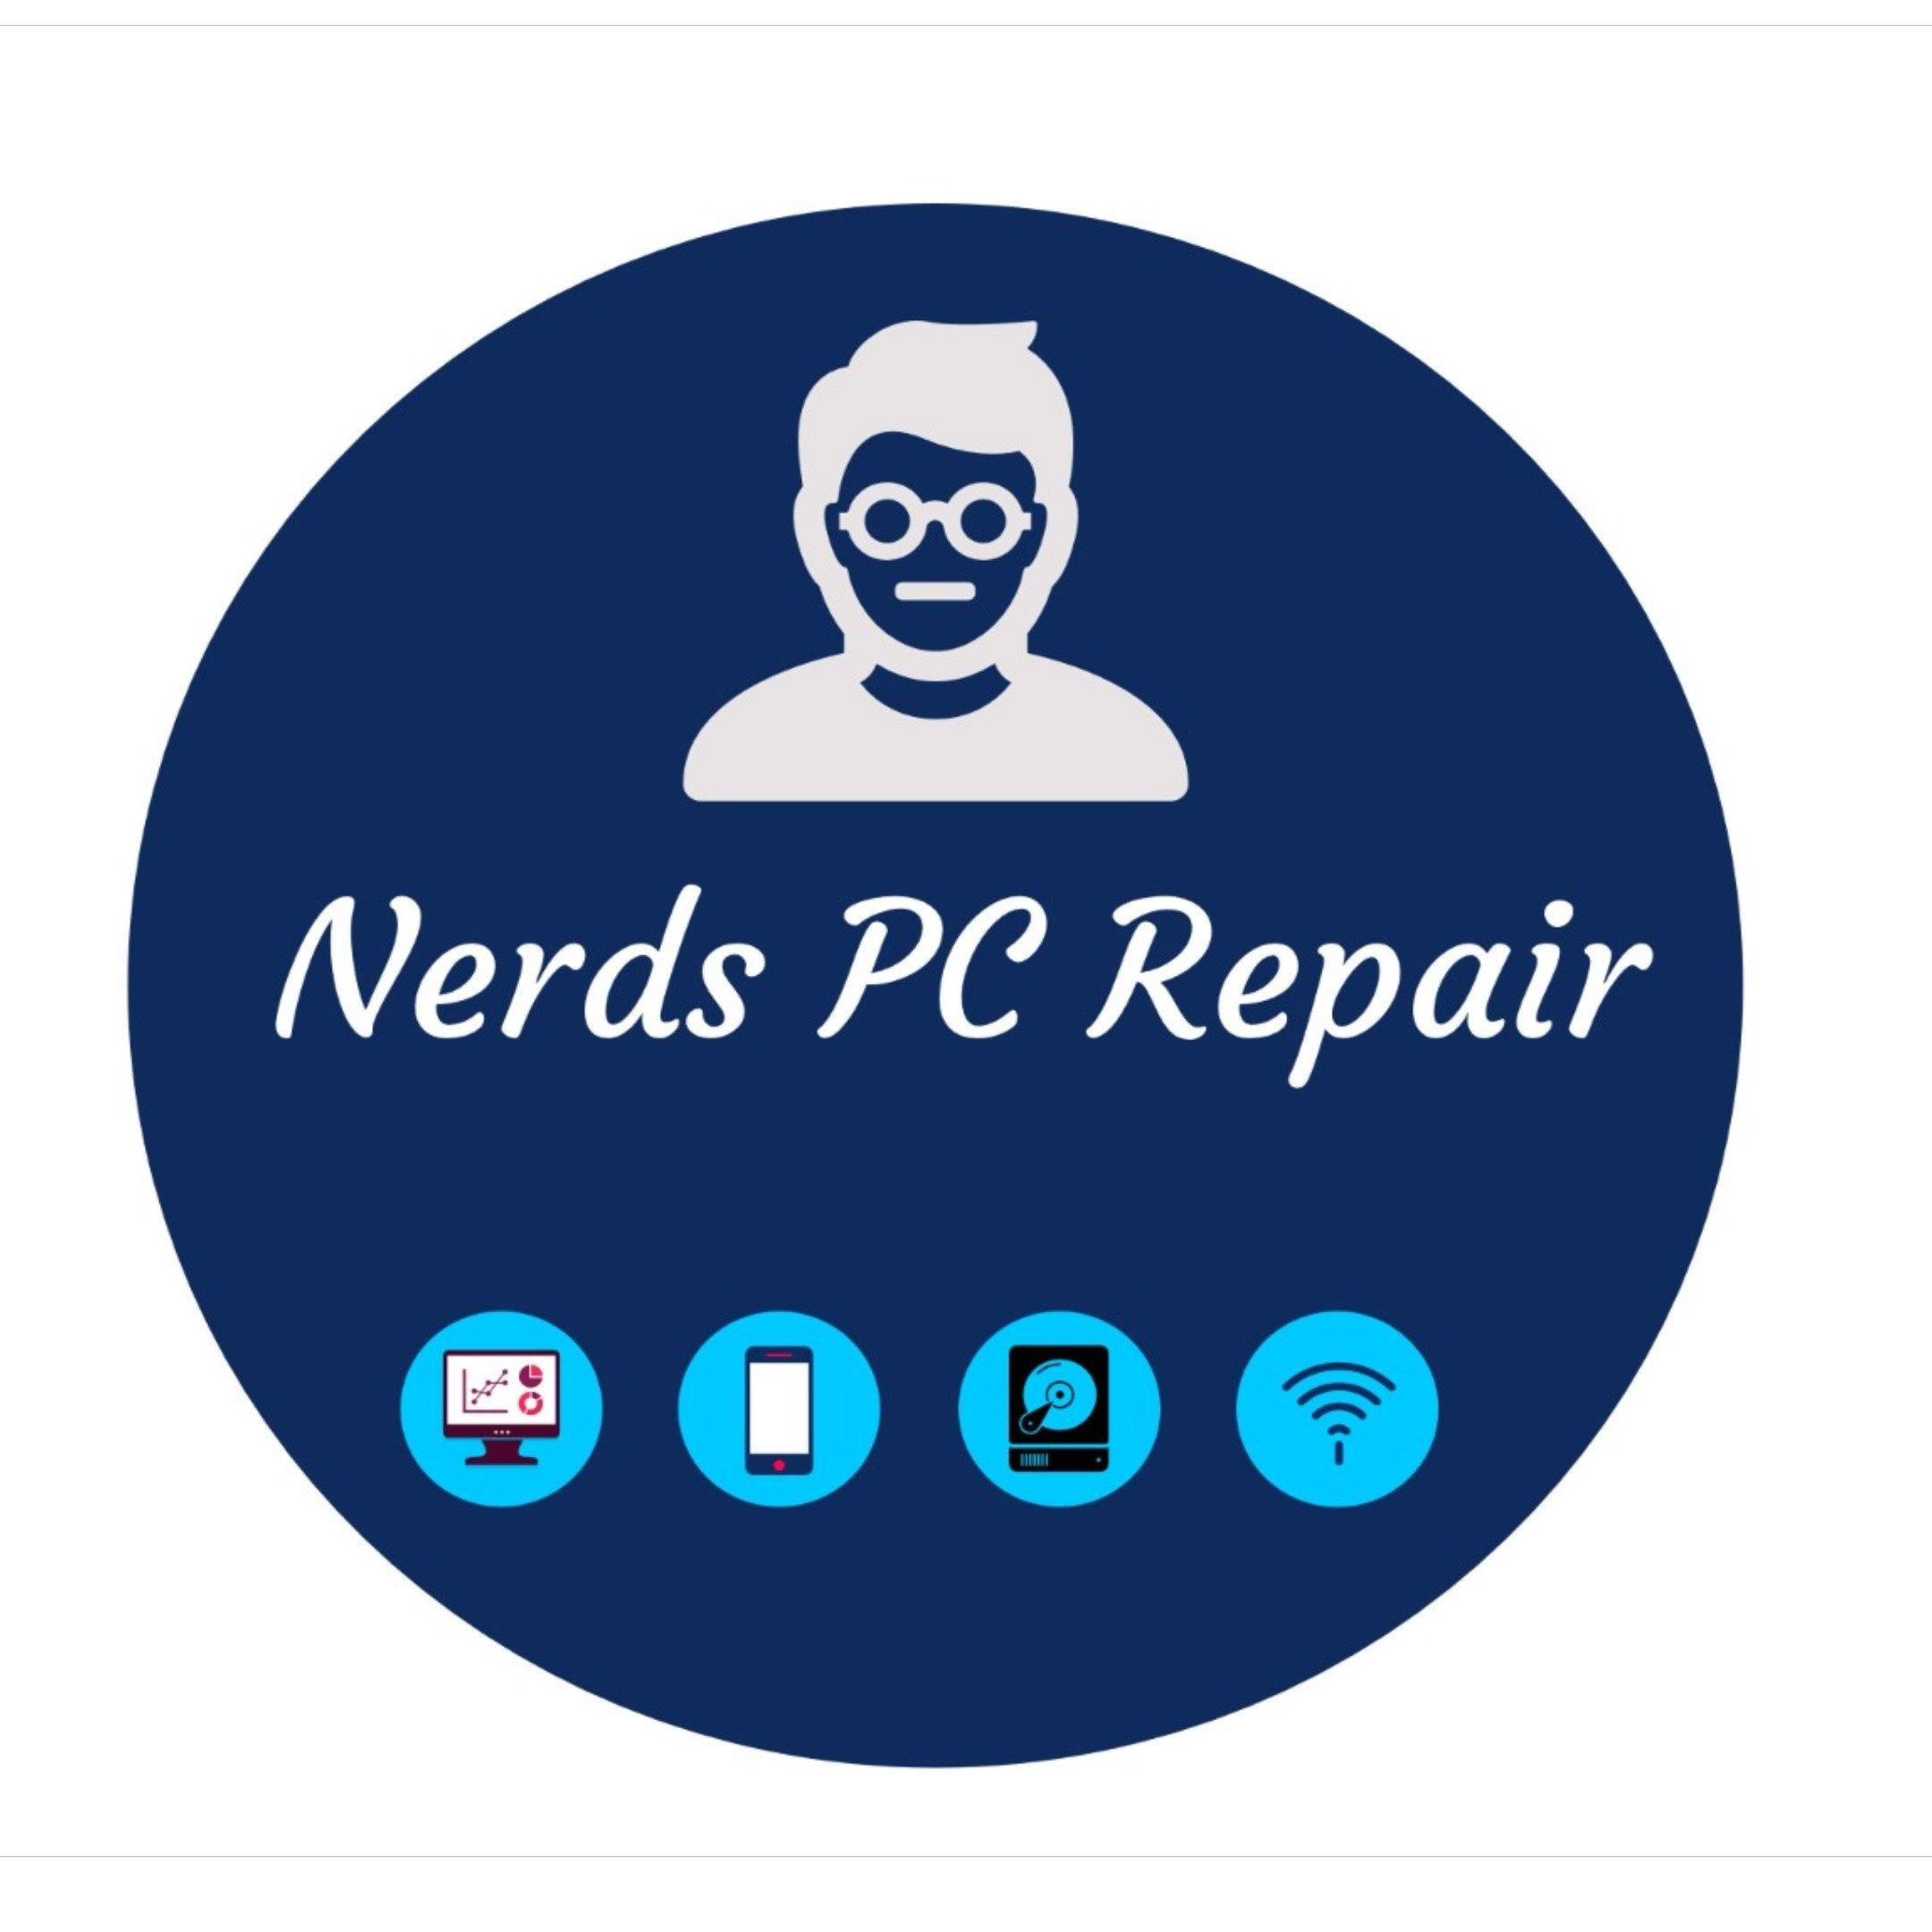 Nerds PC Repair